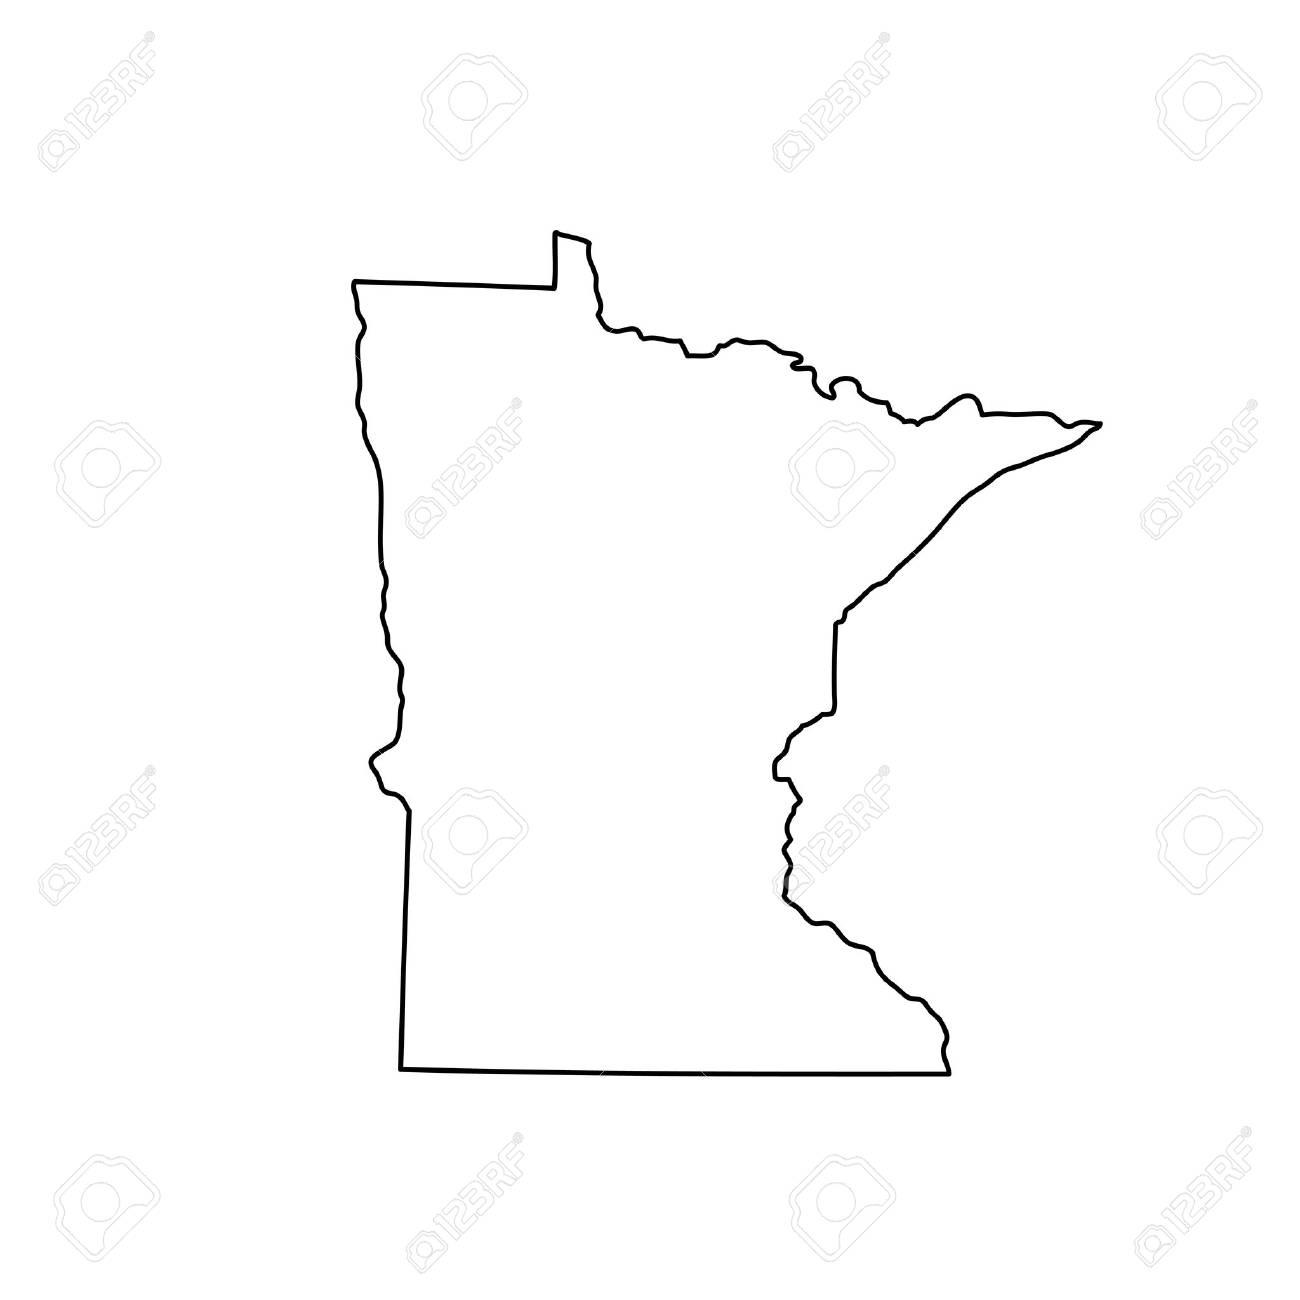 Map of the U.S. state Minnesota Minnesota Map Of Us on us map north dakota, us map wisconsin, atlas map of minnesota, us map michigan, state map of minnesota, us map illinois, us map south dakota, show map of minnesota,